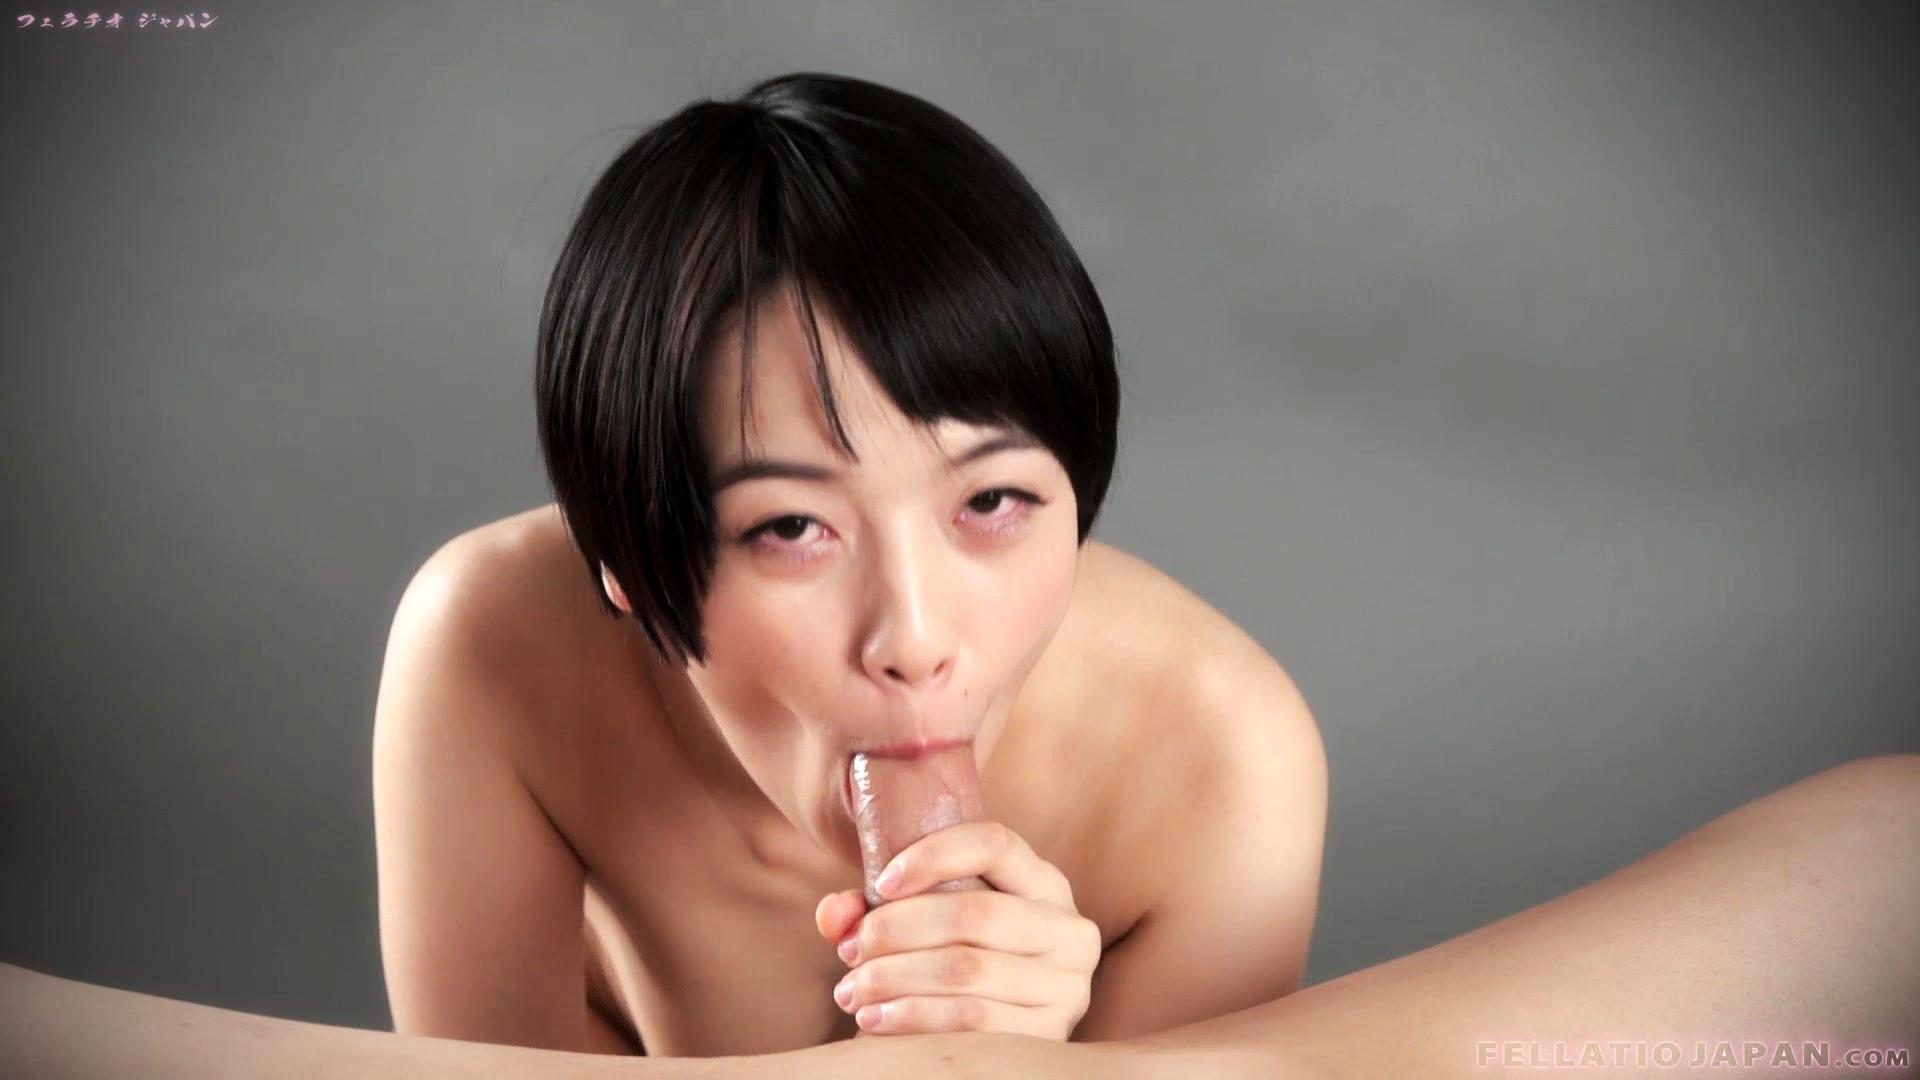 Japanische Blowjob-Bilder